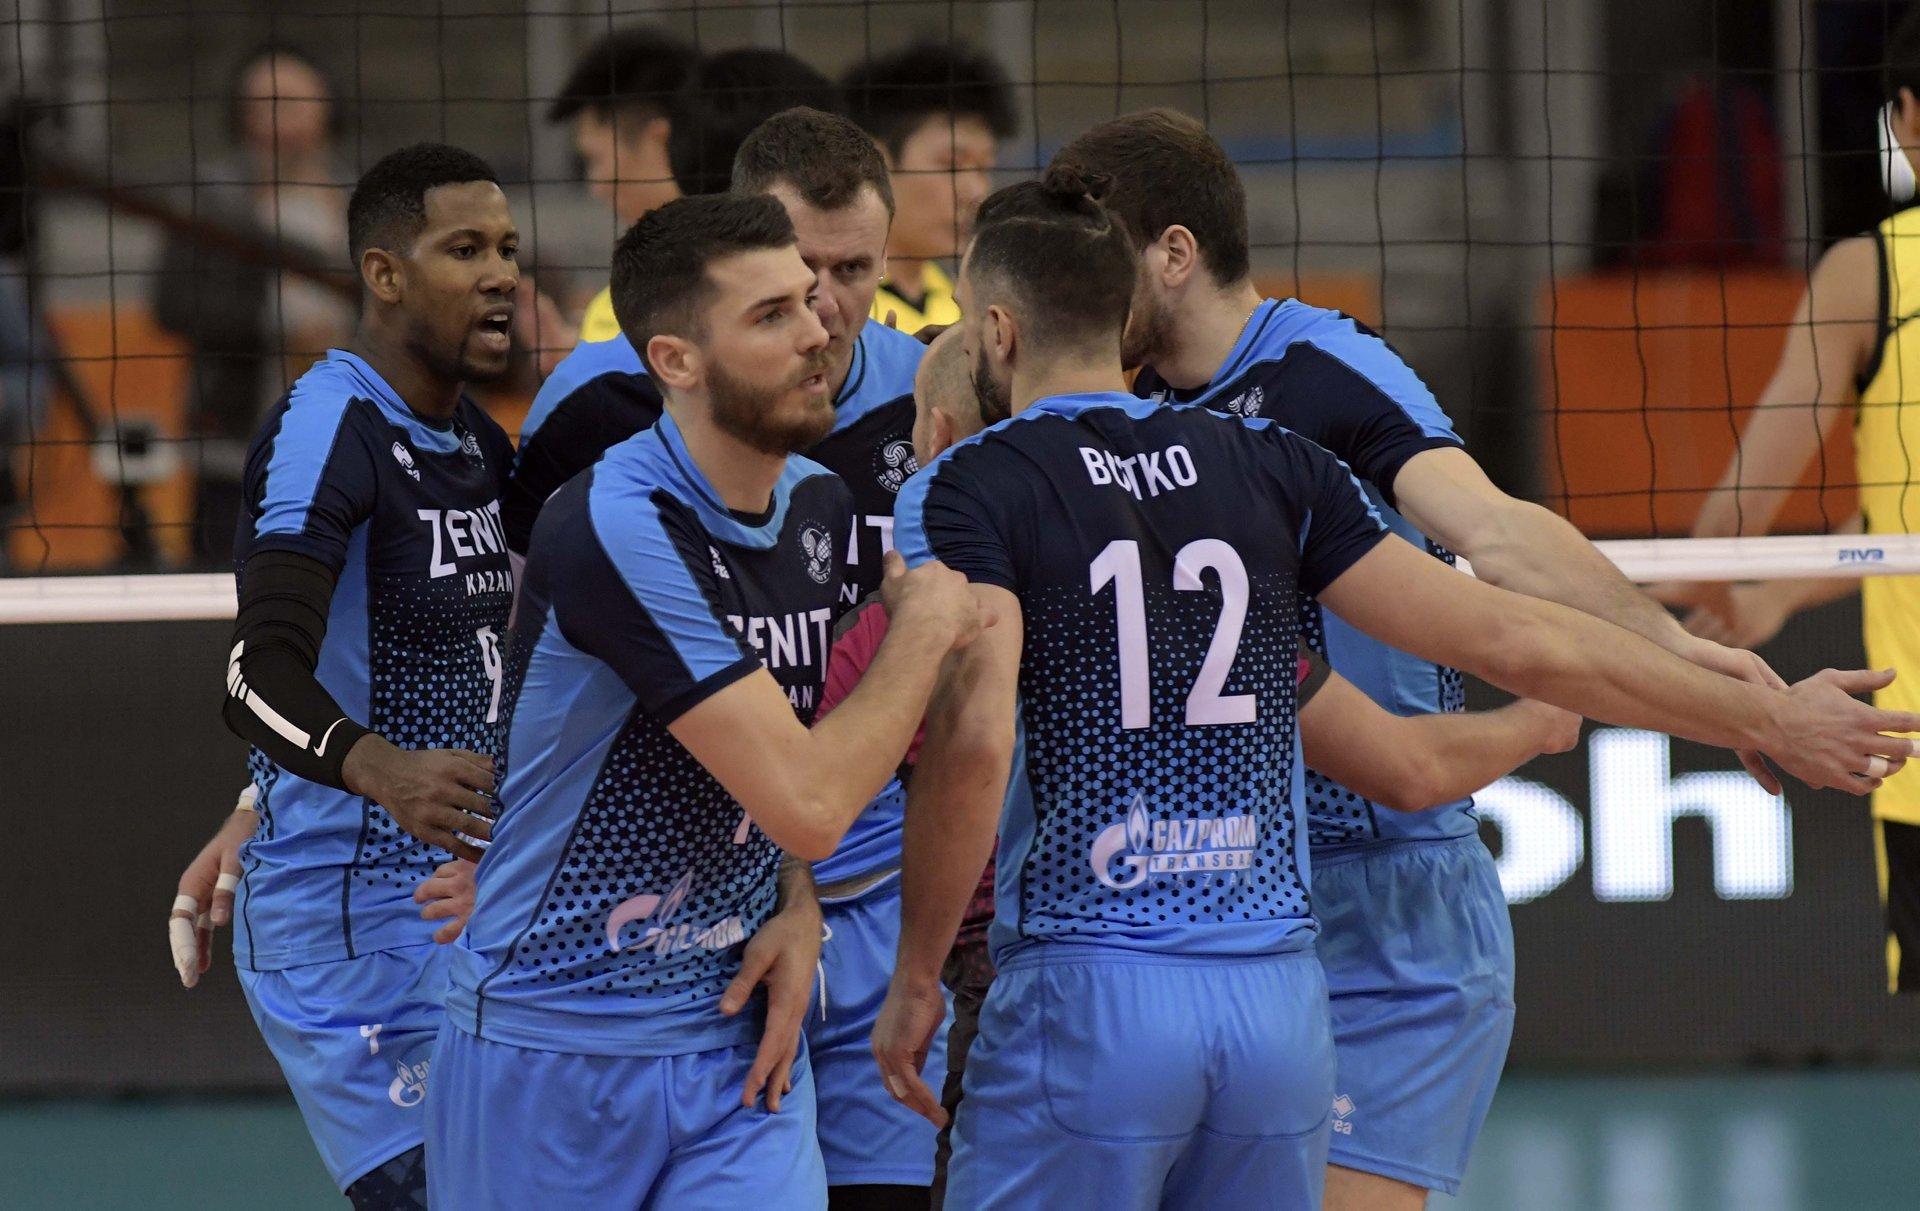 Zenit Kazan Shanghai Volleyball Club 3 0 Polish Volleyball Federation